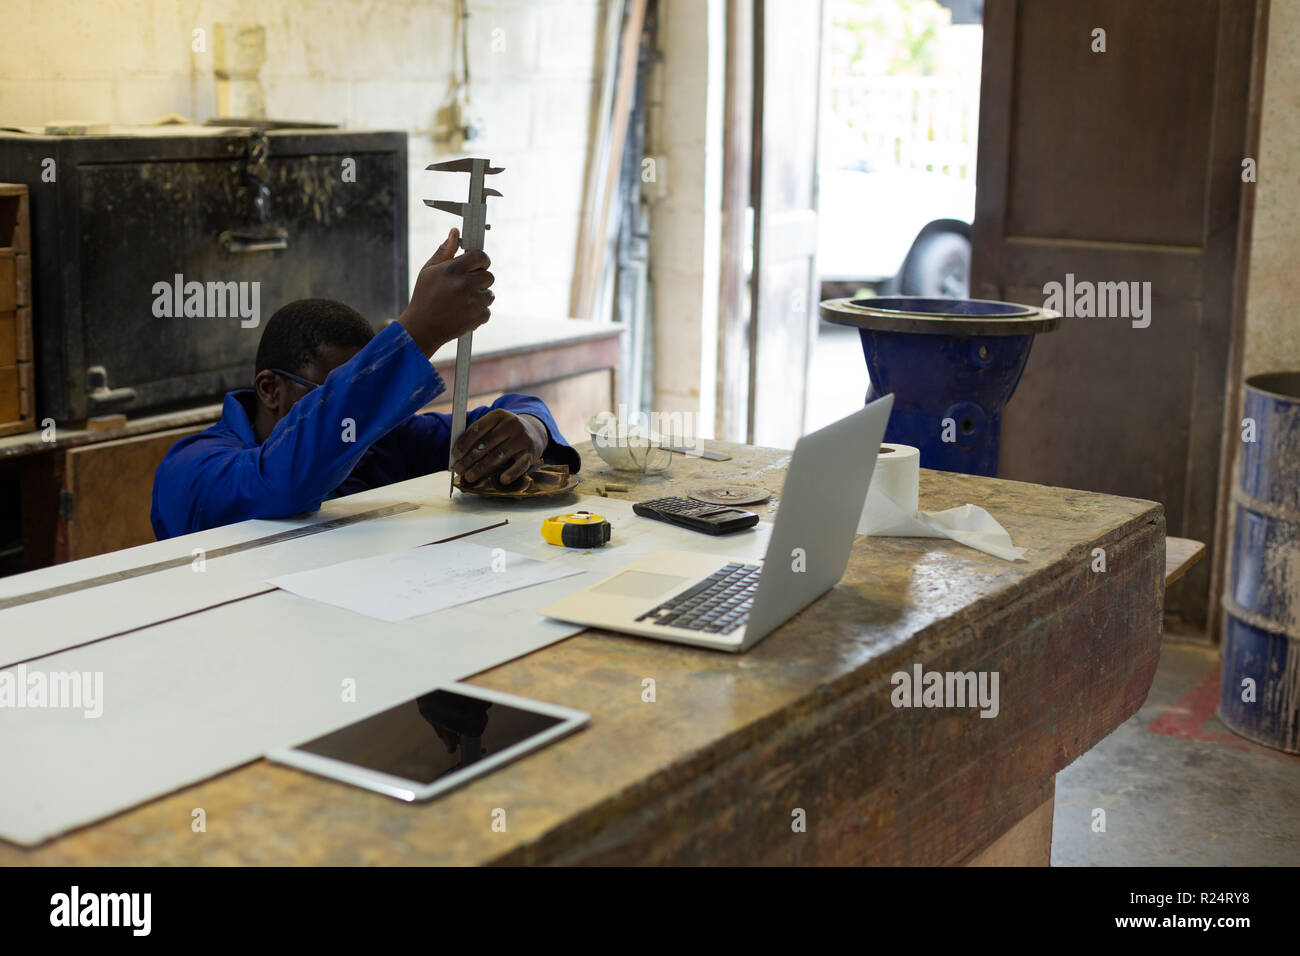 Worker using vernier caliper in foundry workshop - Stock Image